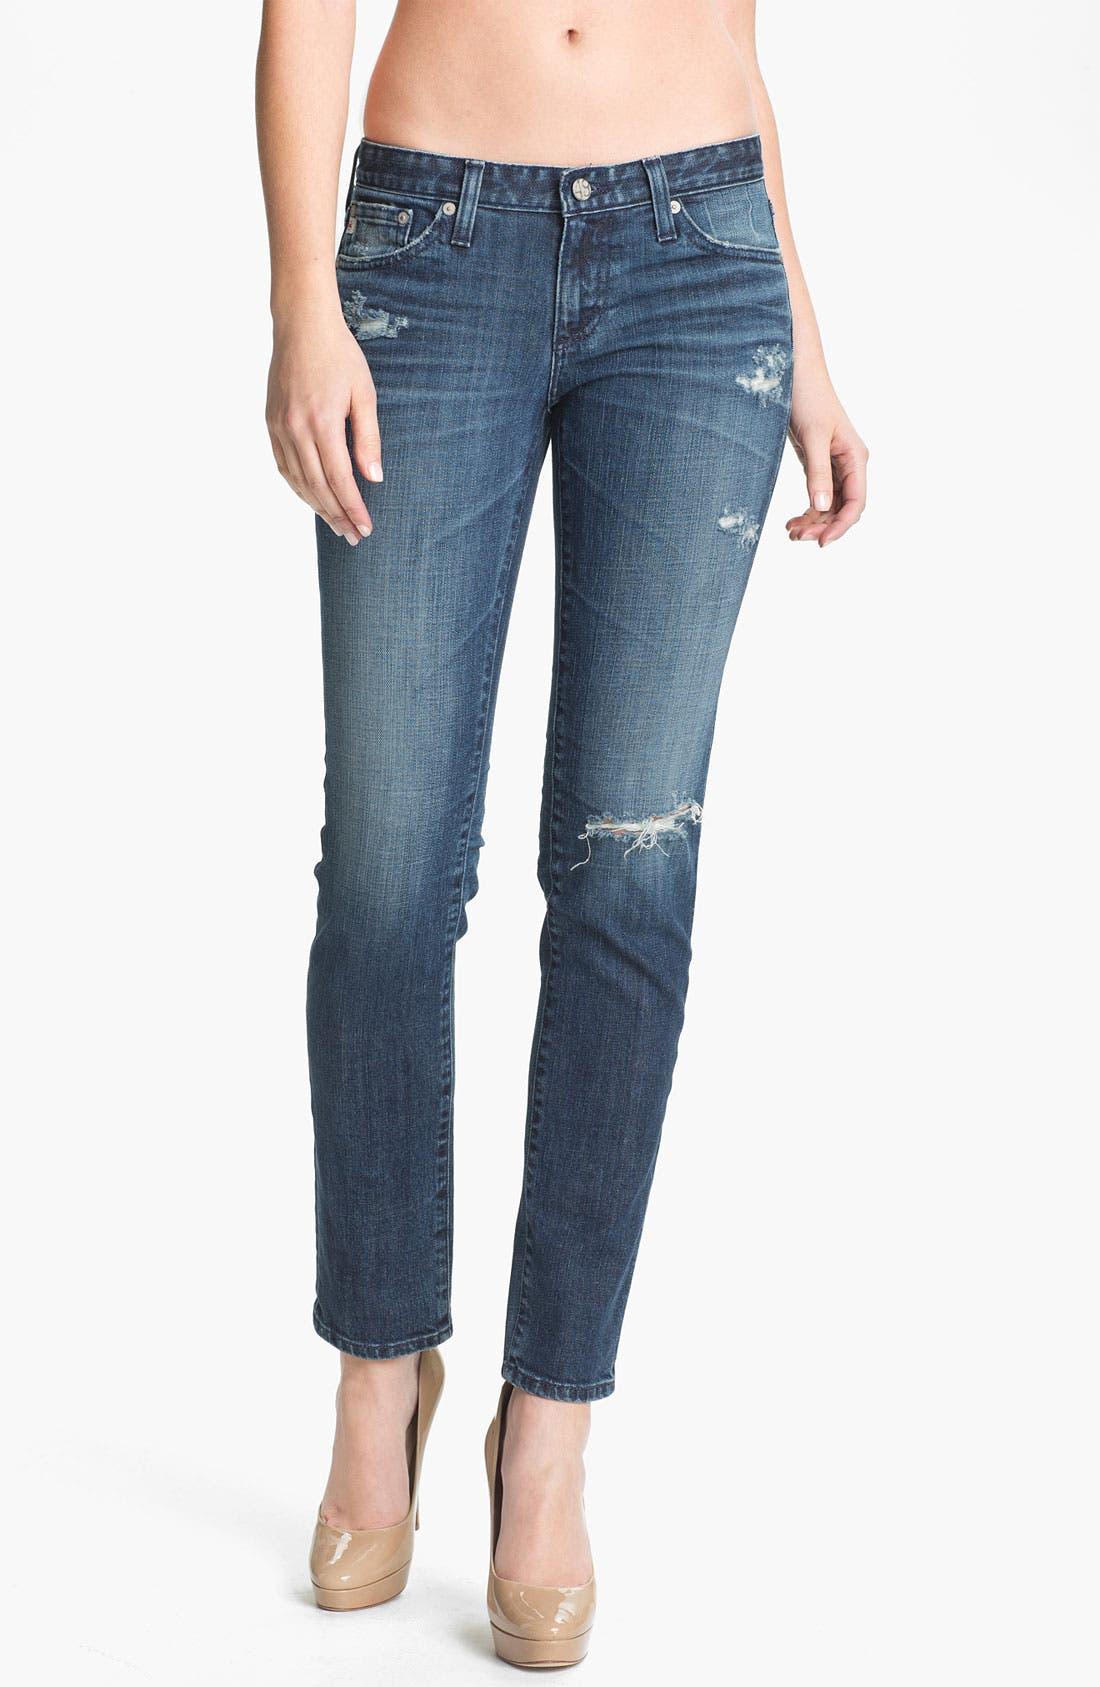 Alternate Image 1 Selected - AG Jeans 'The Stilt' Cigarette Leg Stretch Jeans (7 Year Destroy)